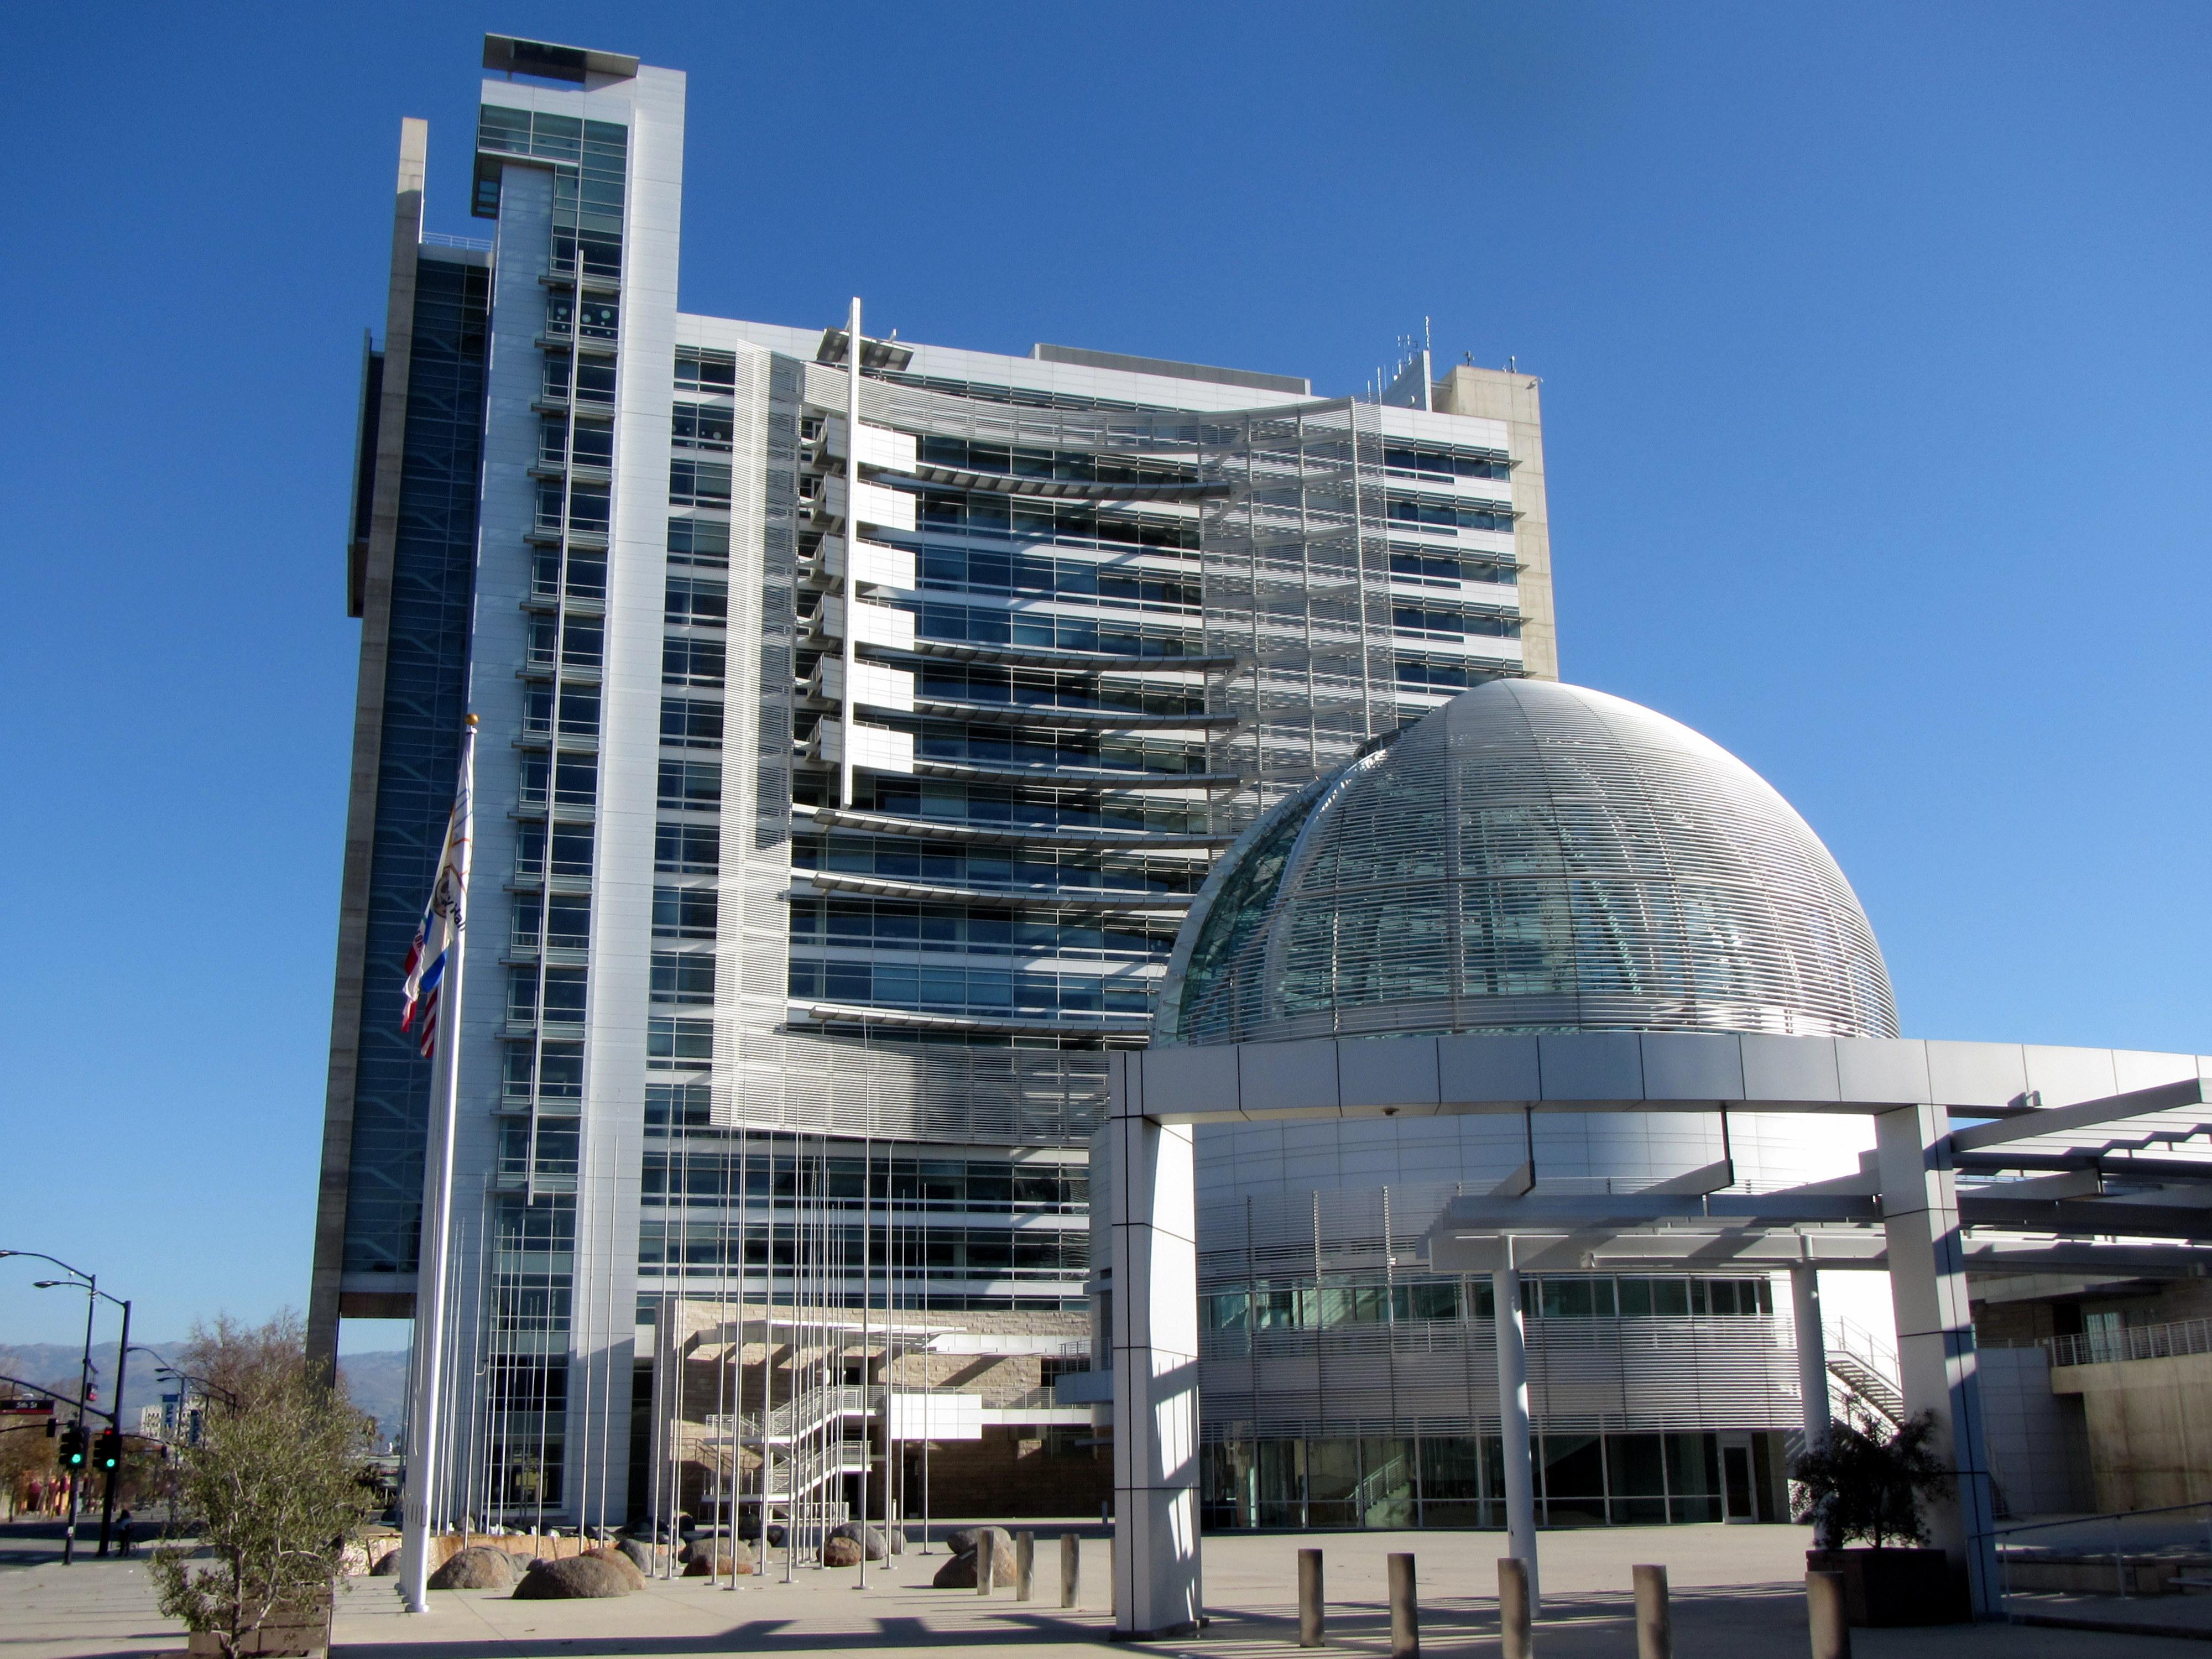 https://upload.wikimedia.org/wikipedia/commons/9/9a/San_Jose_City_Hall_-_panoramio.jpg